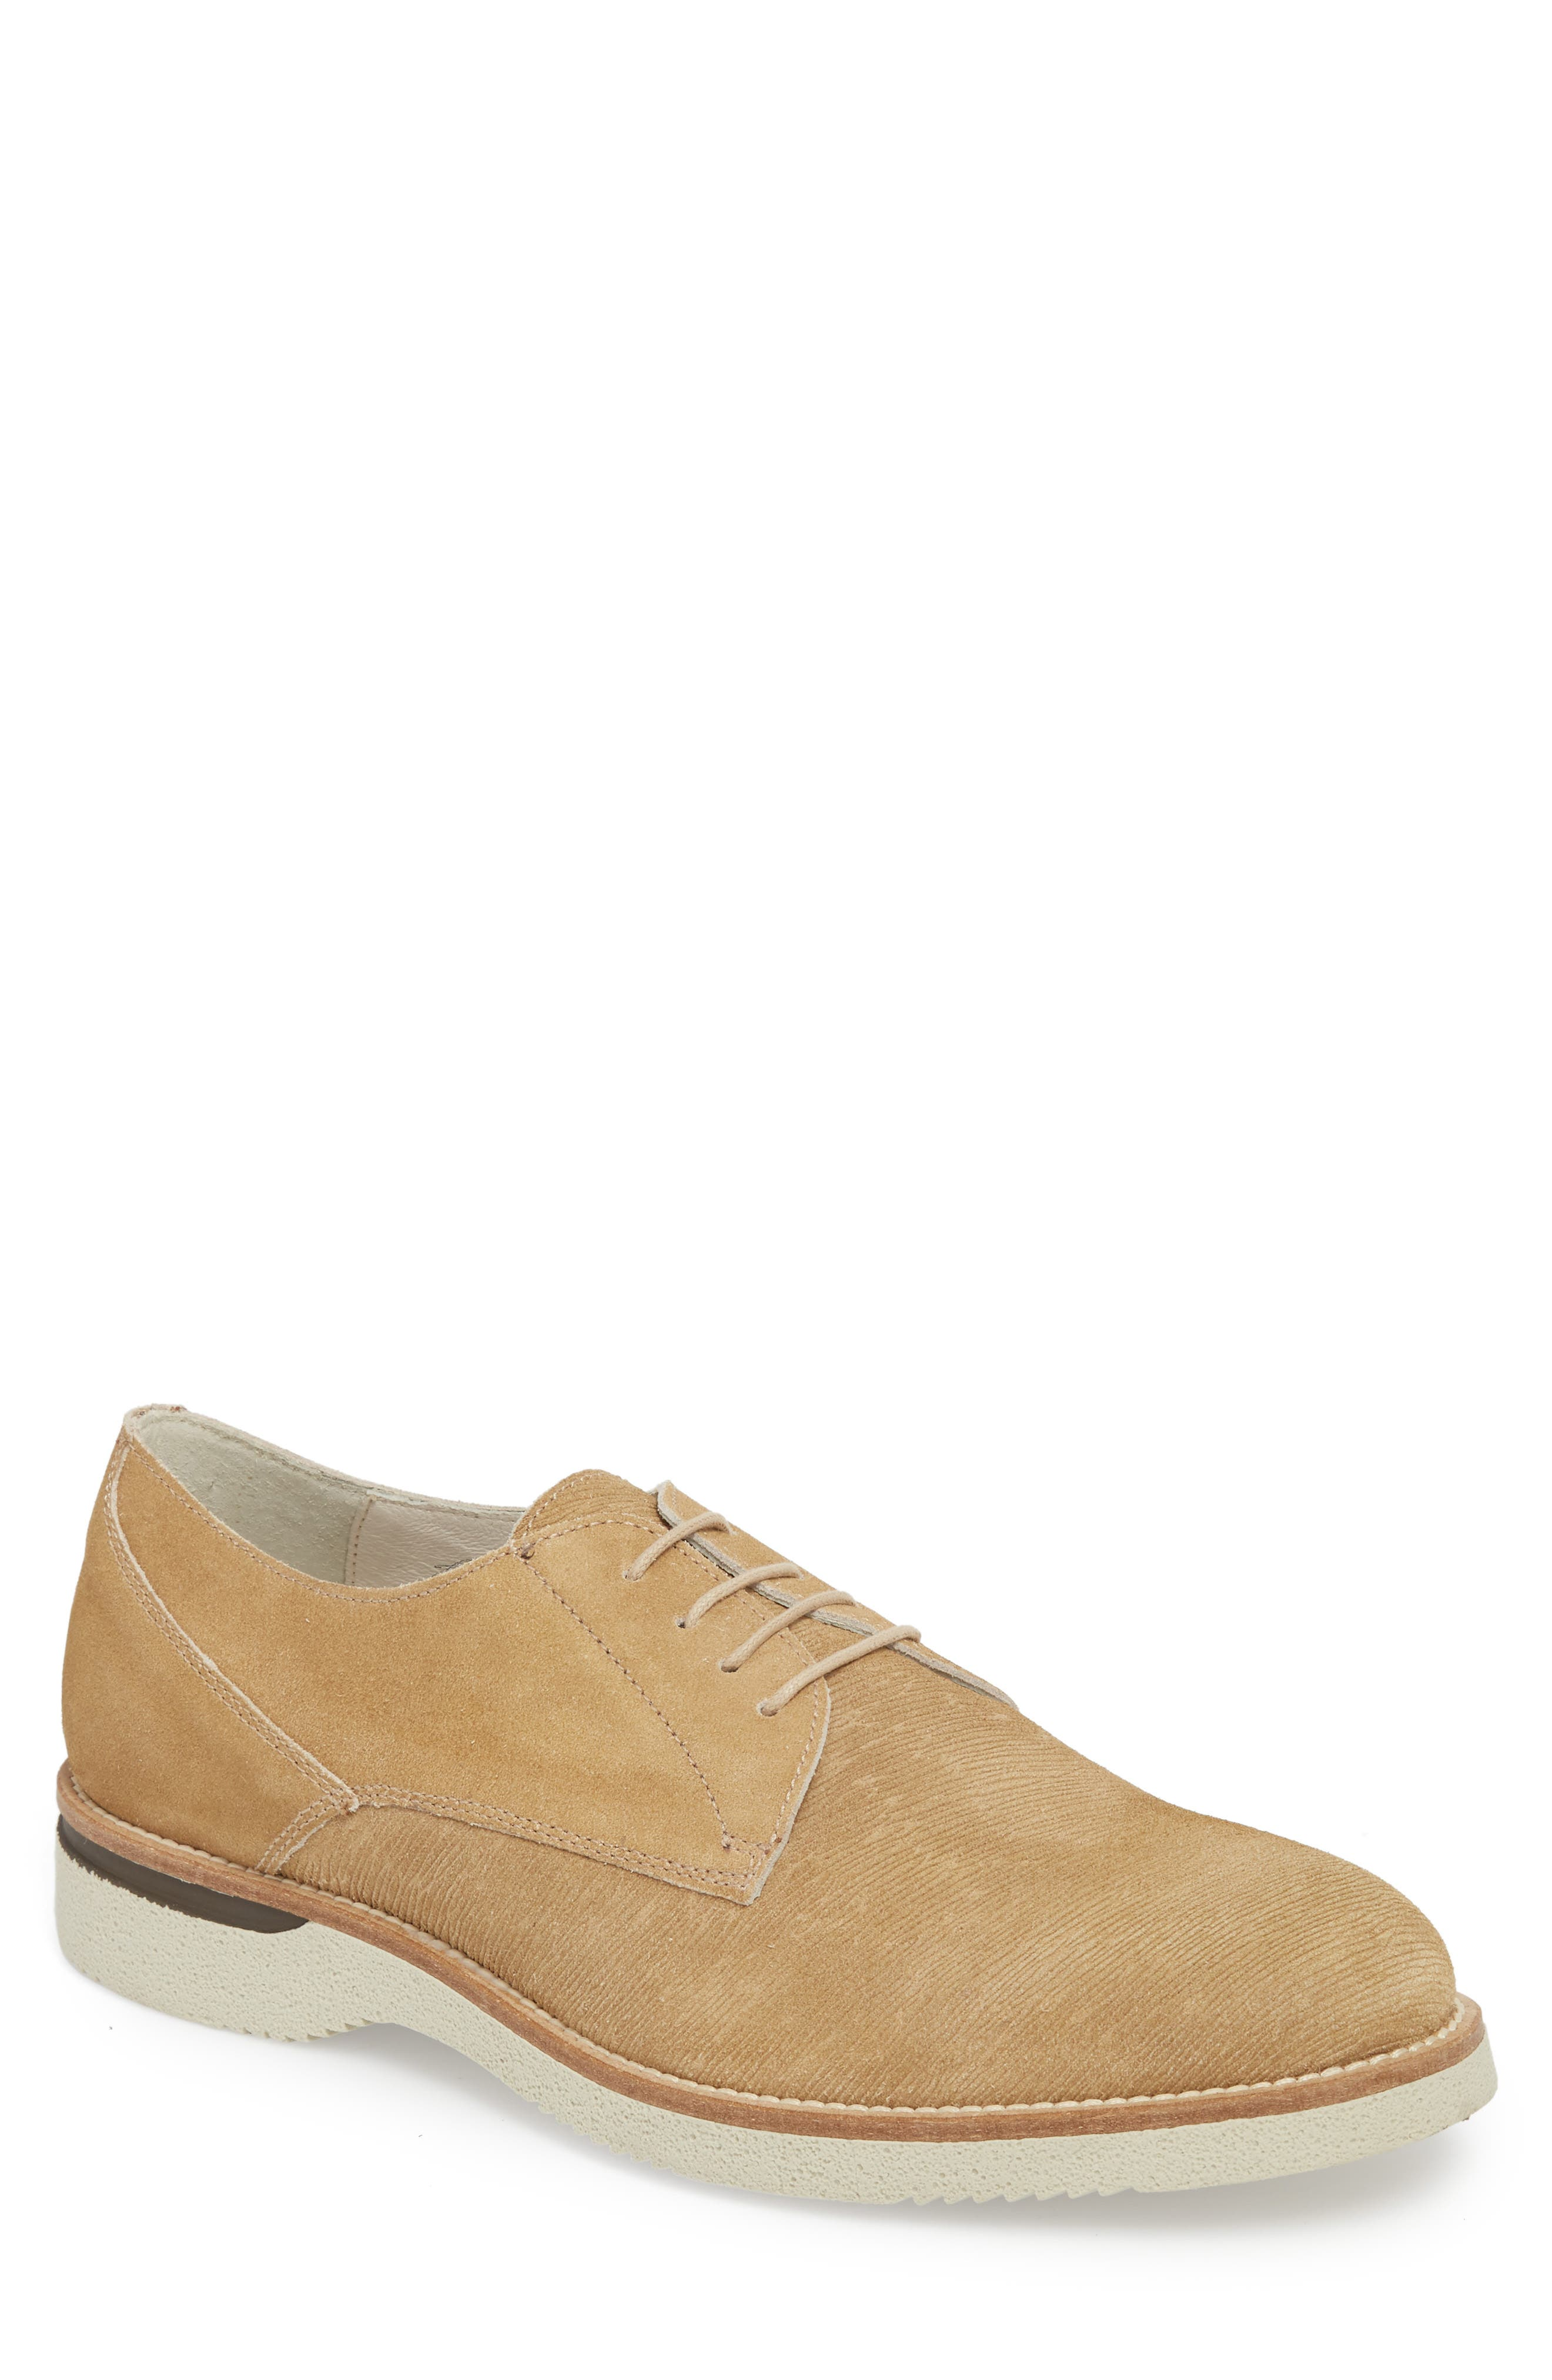 Kenneth Cole New York Douglas Textured Plain Toe Derby (Men)